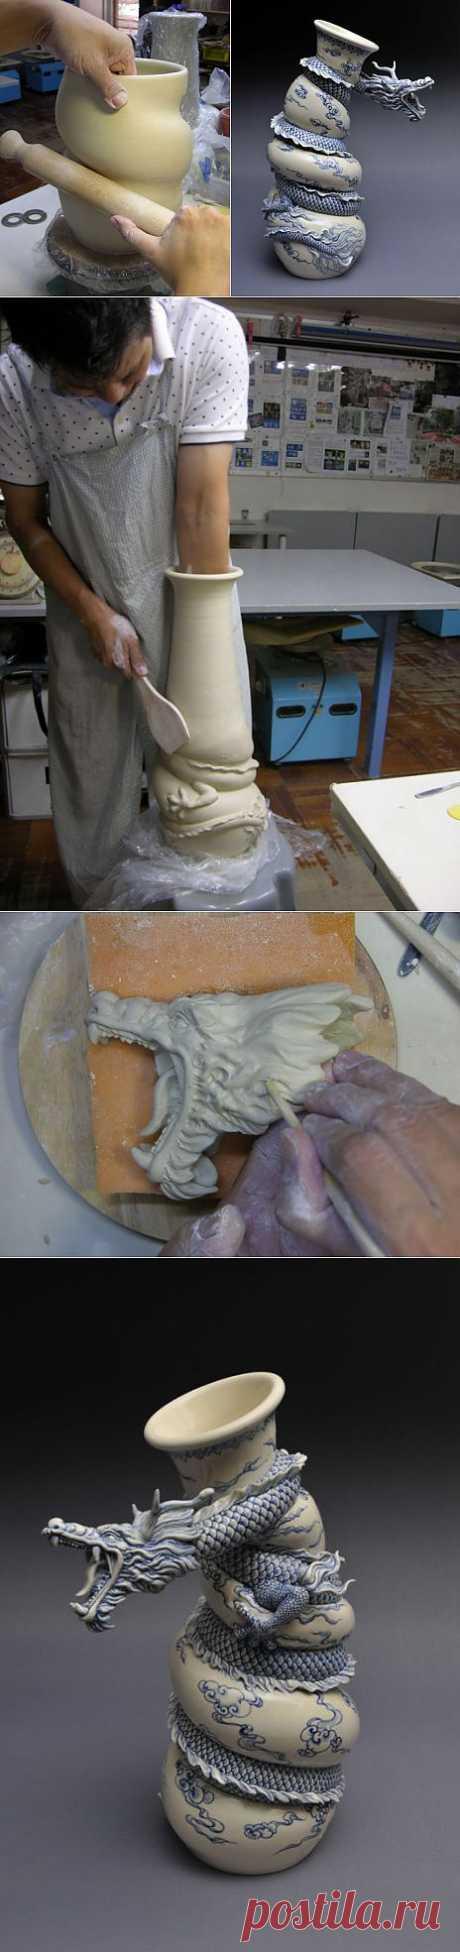 Как рождаются фарфоровые драконы: мастеркласс скульптора Johnson Tsang | Скульптура | Арт